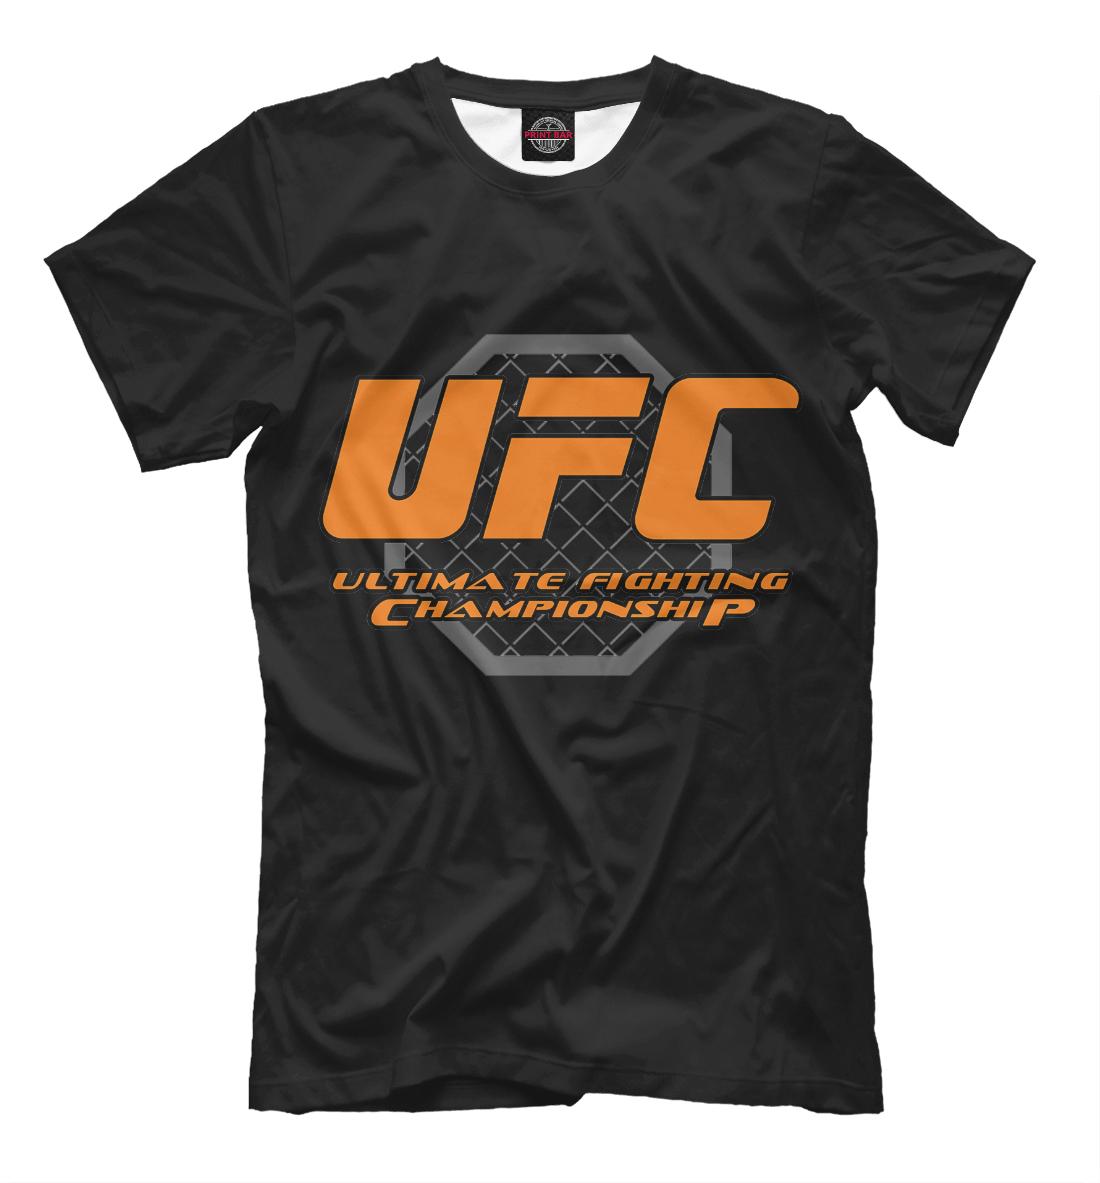 Купить Ultimate Fighting Championship, Printbar, Футболки, MNU-349331-fut-2